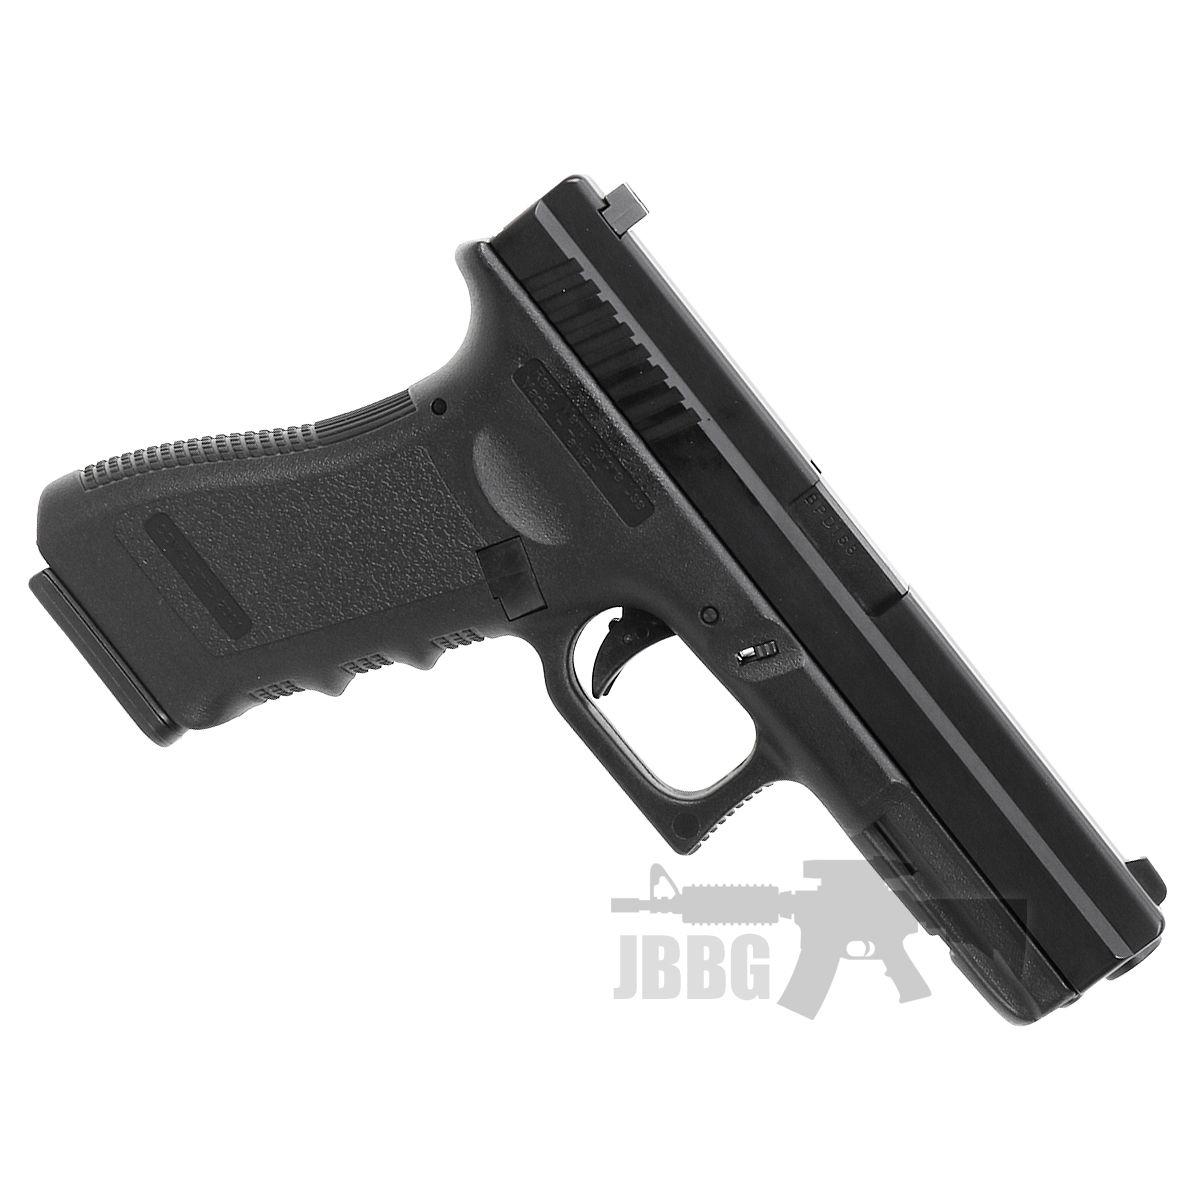 hg184 airsoft bb pistol 2